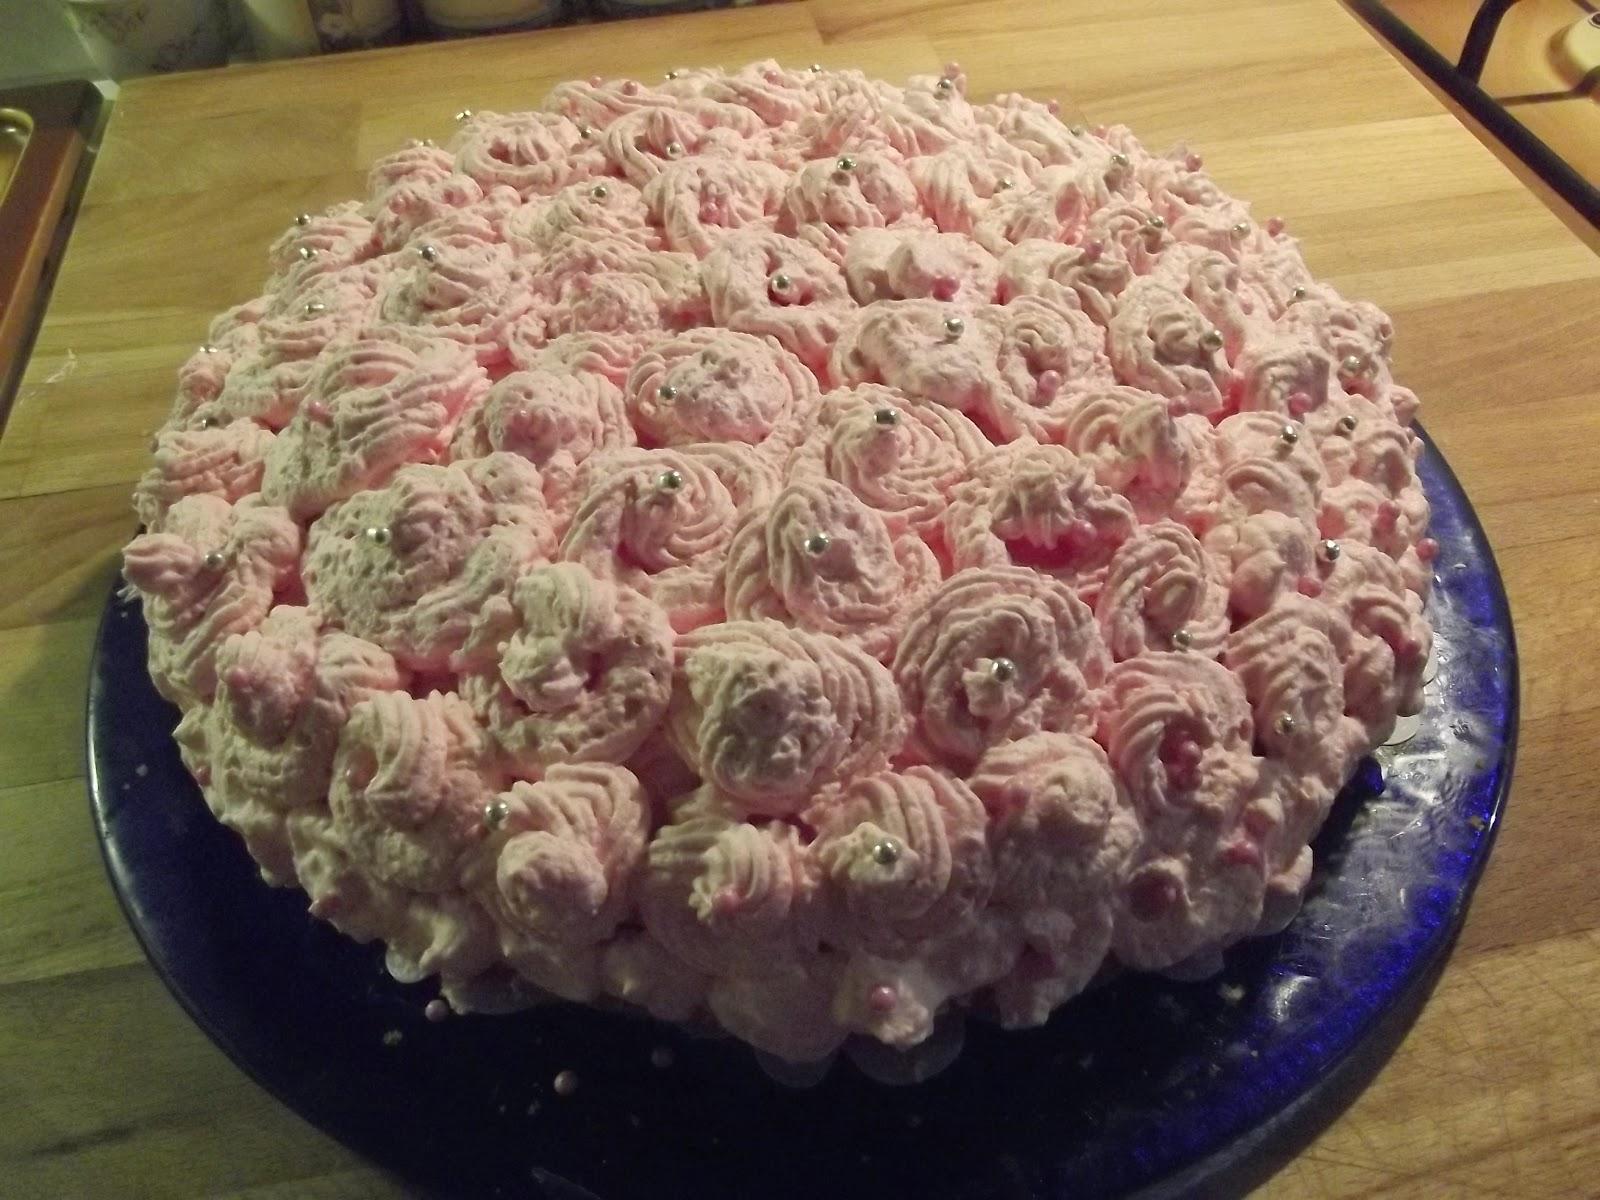 Immagine della torta la mia pink rose dal blog Sabrinaincucina